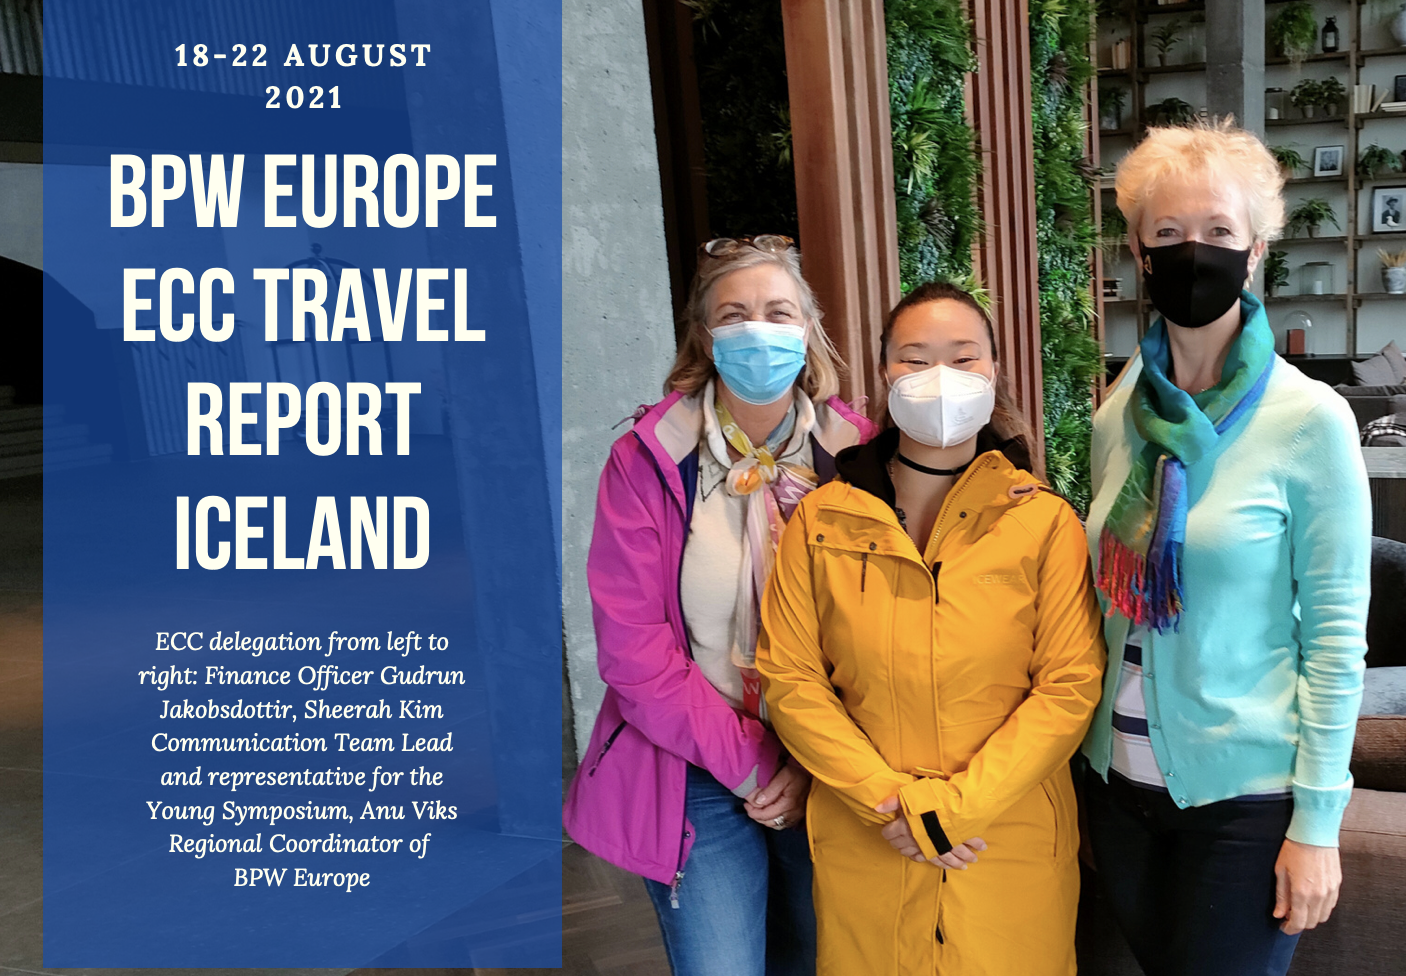 Report on ECC Iceland Visit by Sheerah Kim